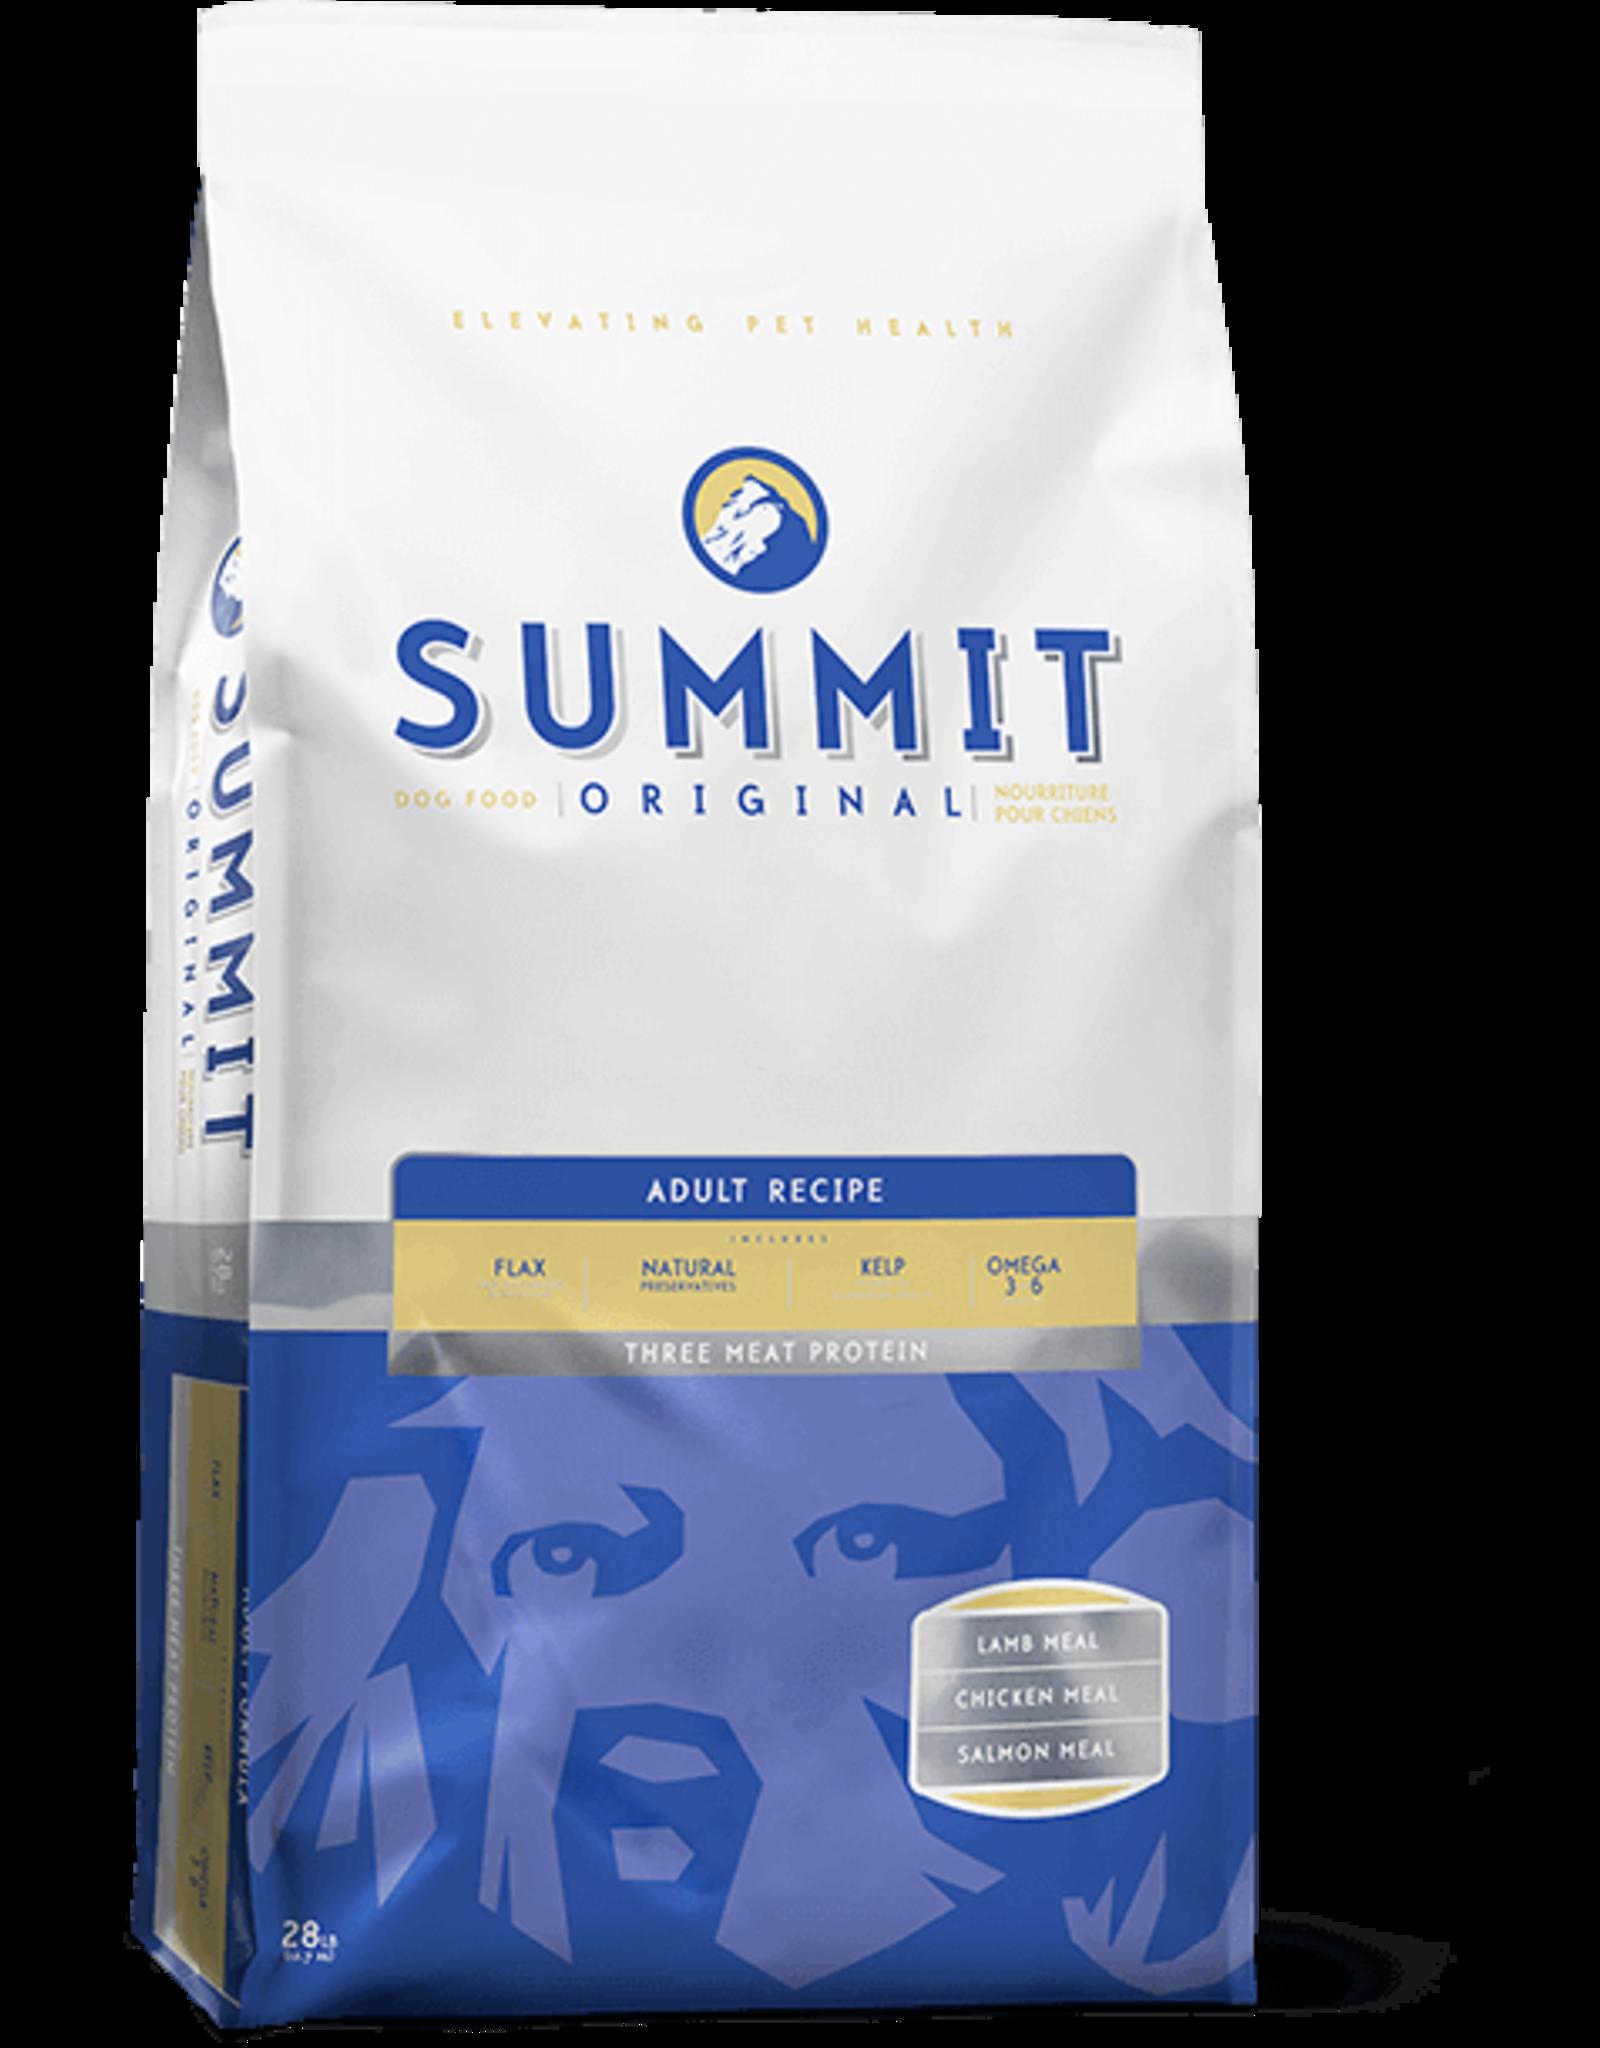 Summit Summit - Original 3 Meat Adult Dog 28lb